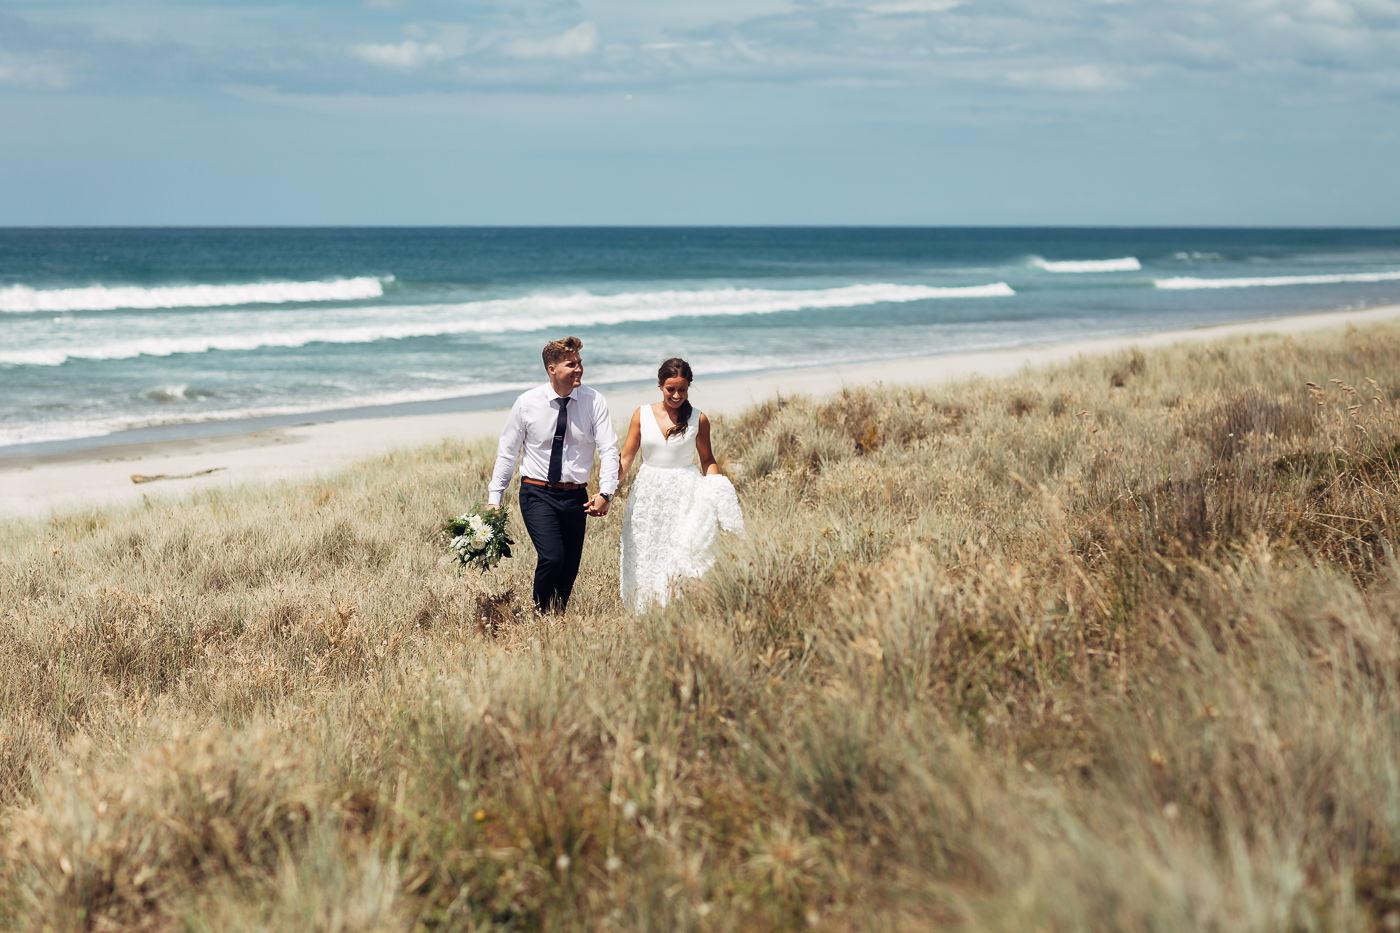 Anne-Hilde & Pieter - januarbryllup i slående vakre Tauranga, New Zealand Bryllupsfotograf New Zealand strand 16 Brudepar